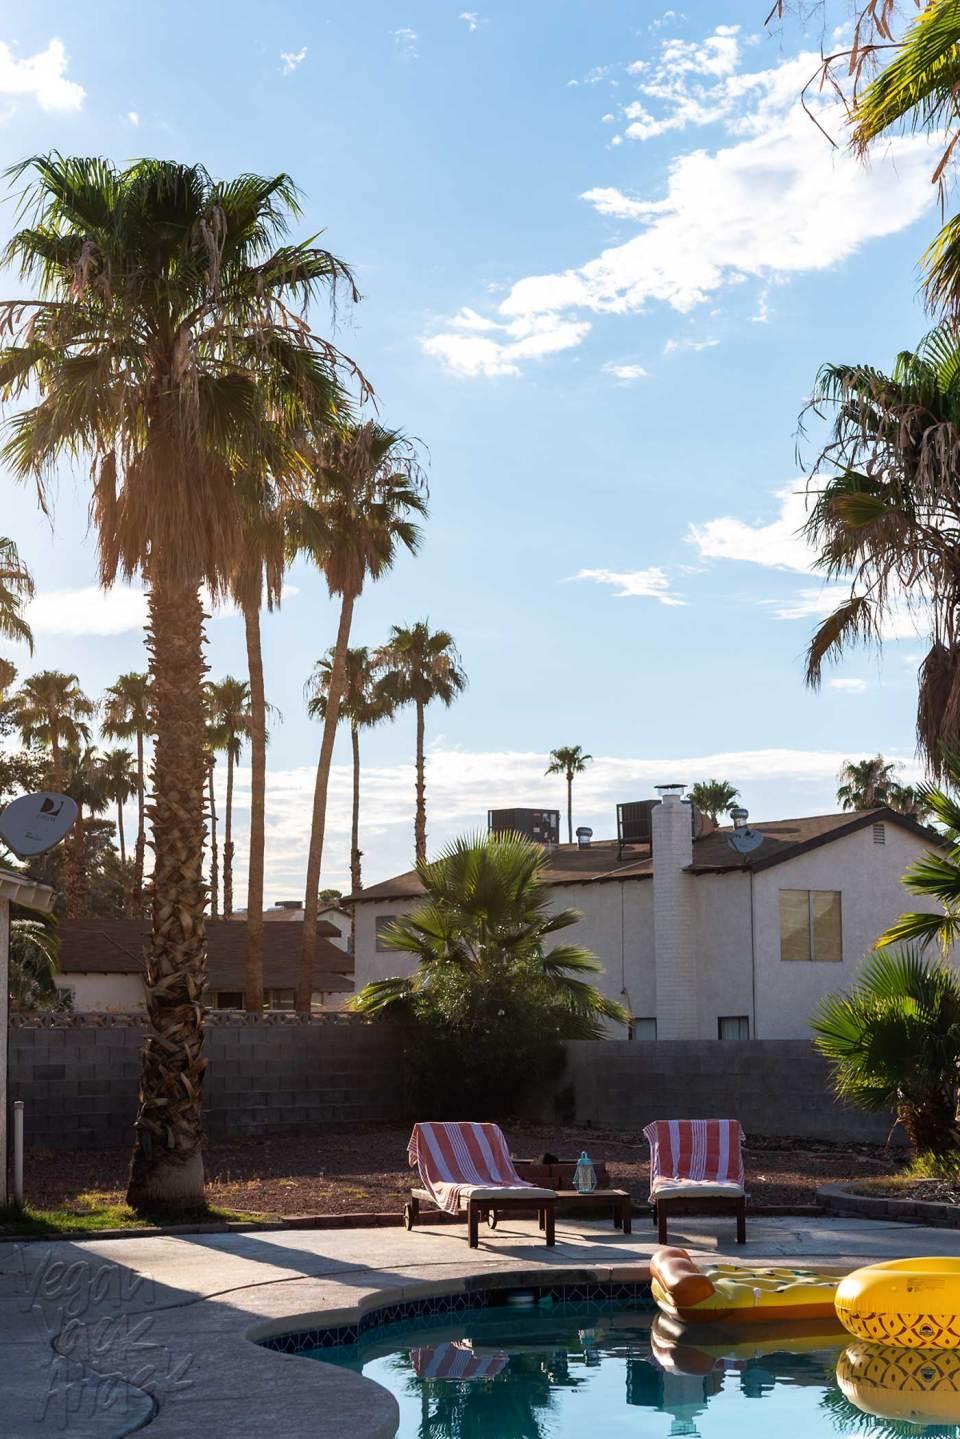 Las Vegas Sunset and Pool